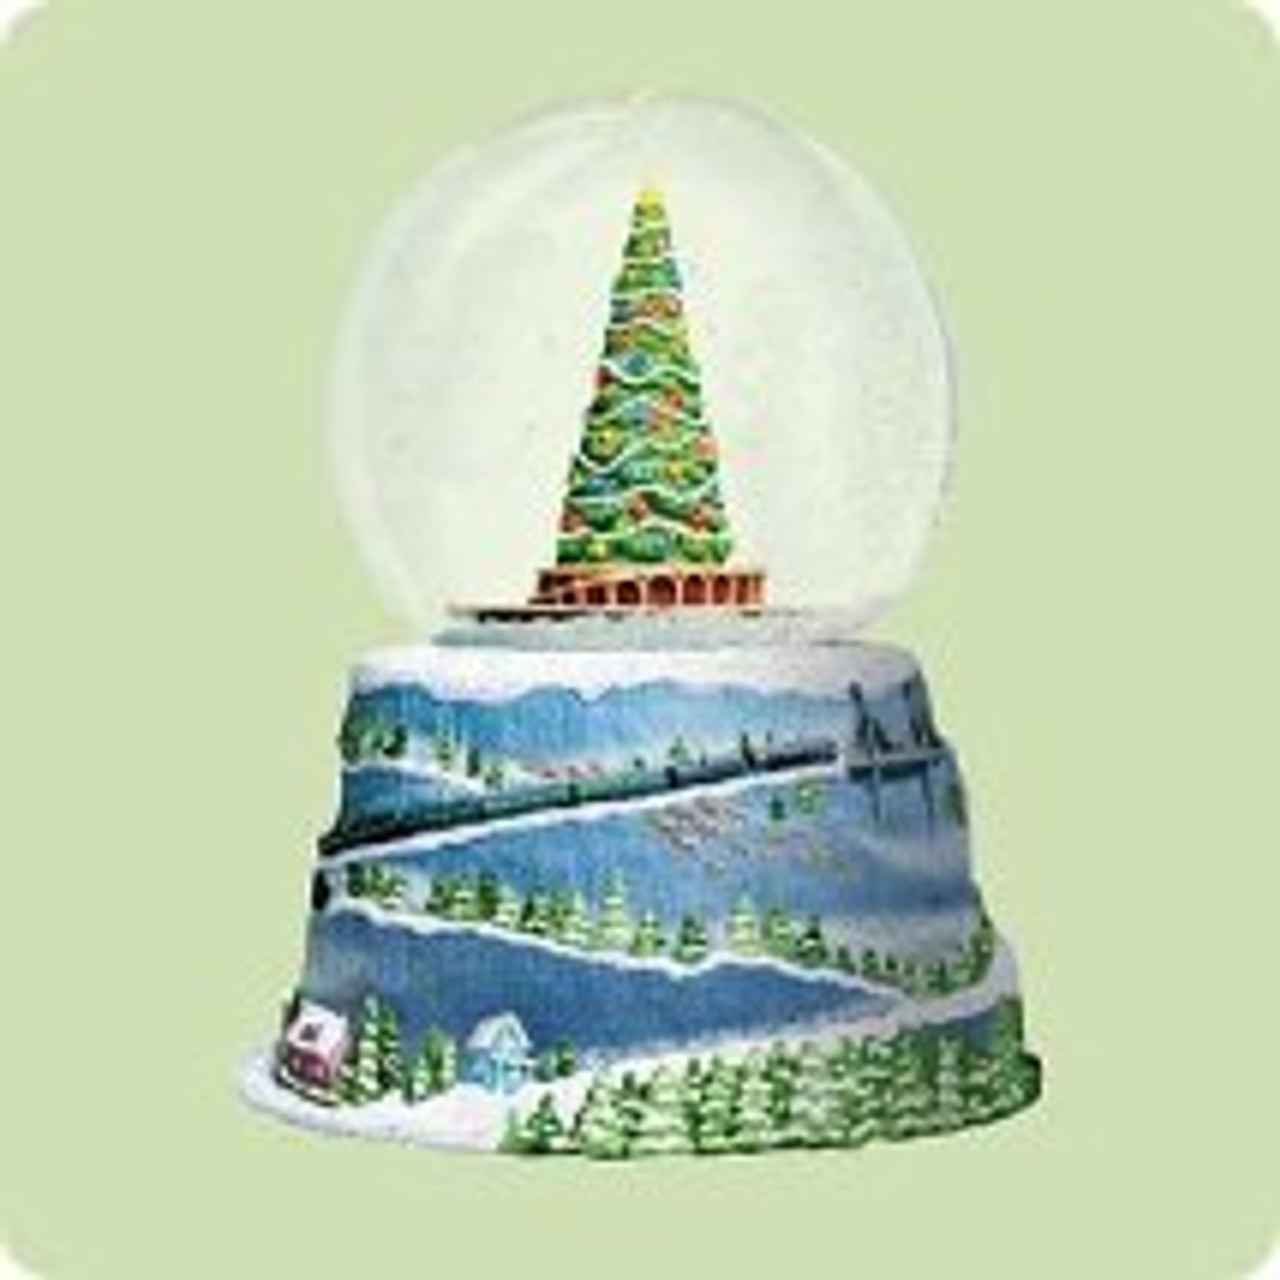 Pleasant 2004 Polar Express Snow Globe And Train Hallmark Ornament The Funny Birthday Cards Online Elaedamsfinfo